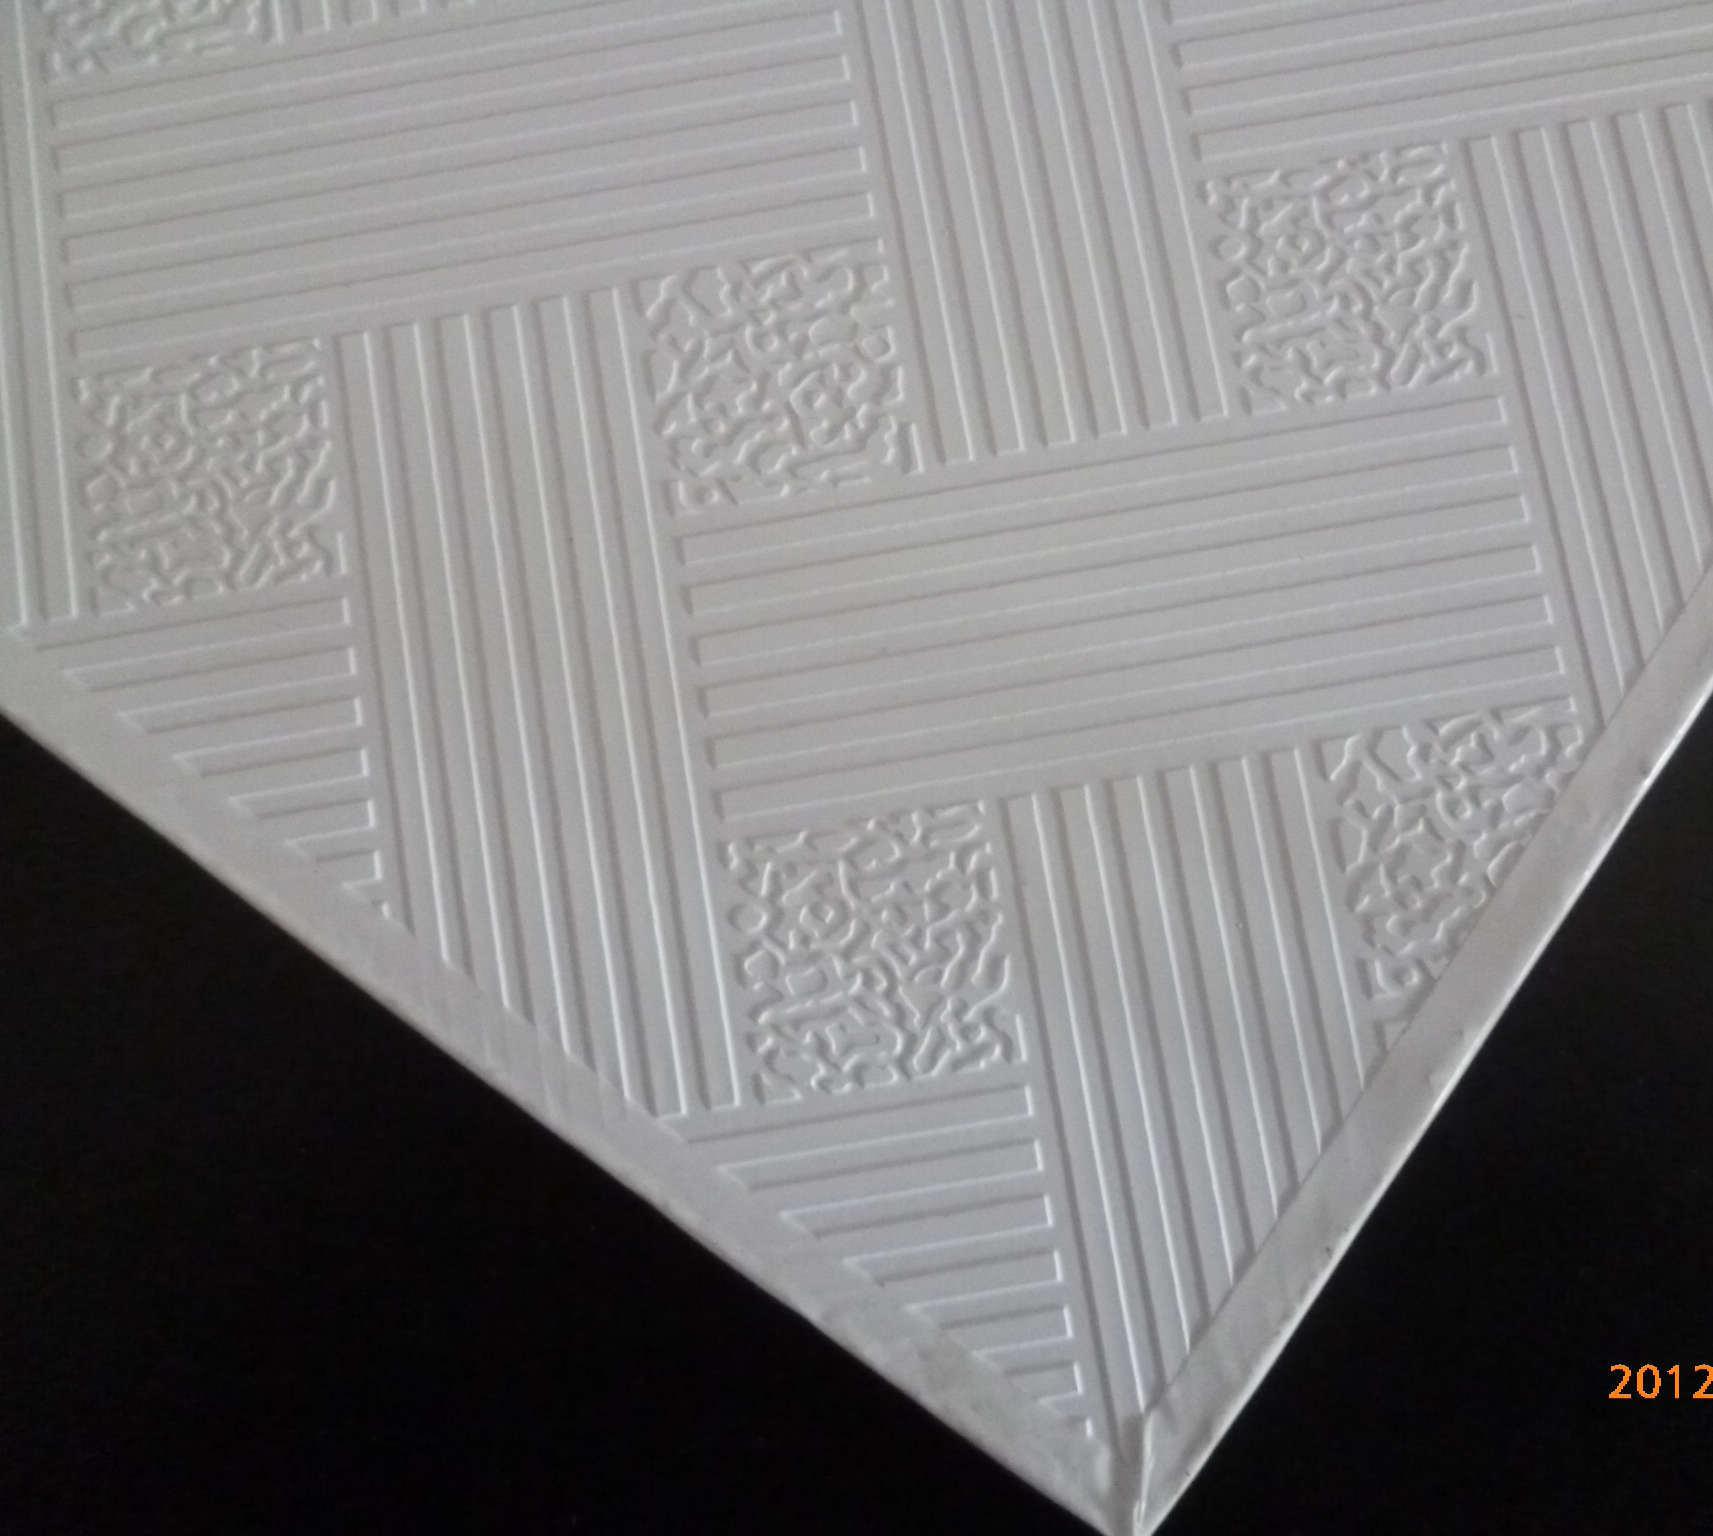 Pvc gypsum ceiling board hebei saiding building material co pvc gypsum ceiling board hebei saiding building material co ltd page 1 dailygadgetfo Images